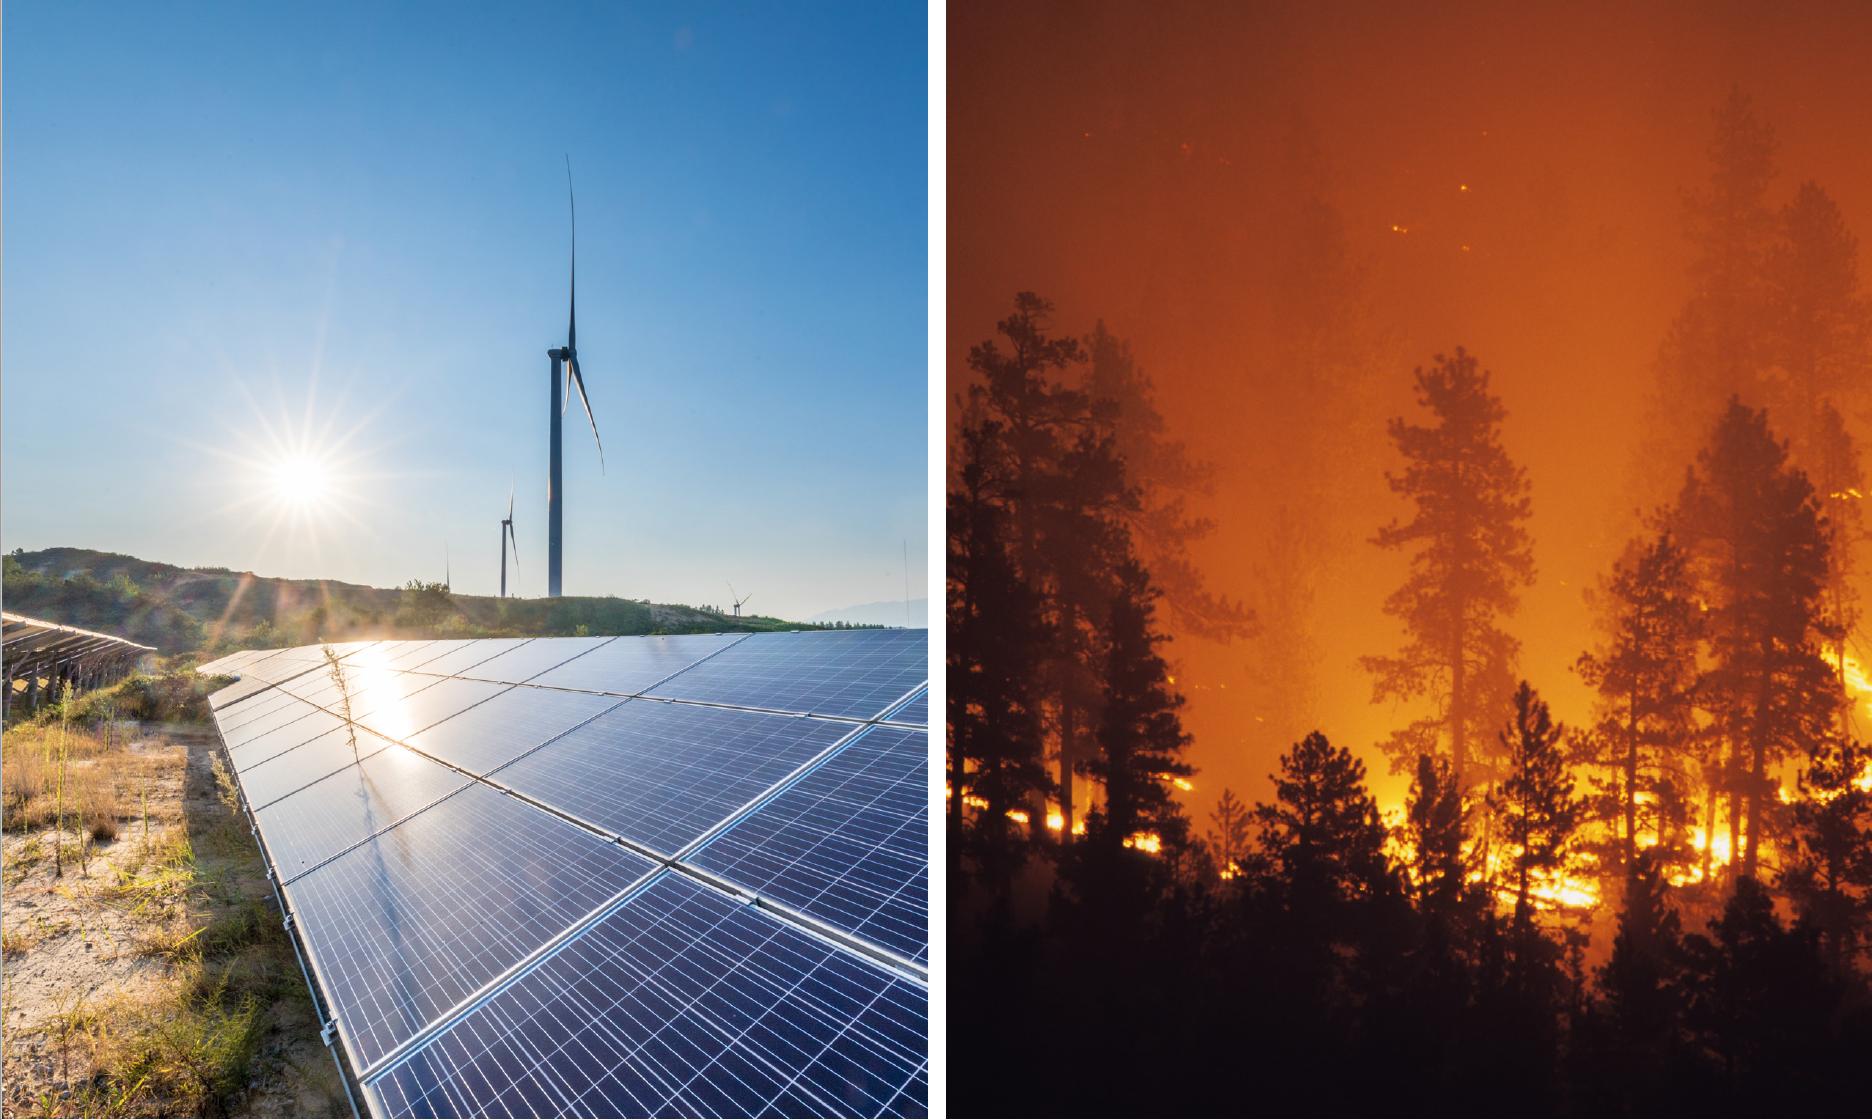 solutions manual for environmental economics charles d kolstad